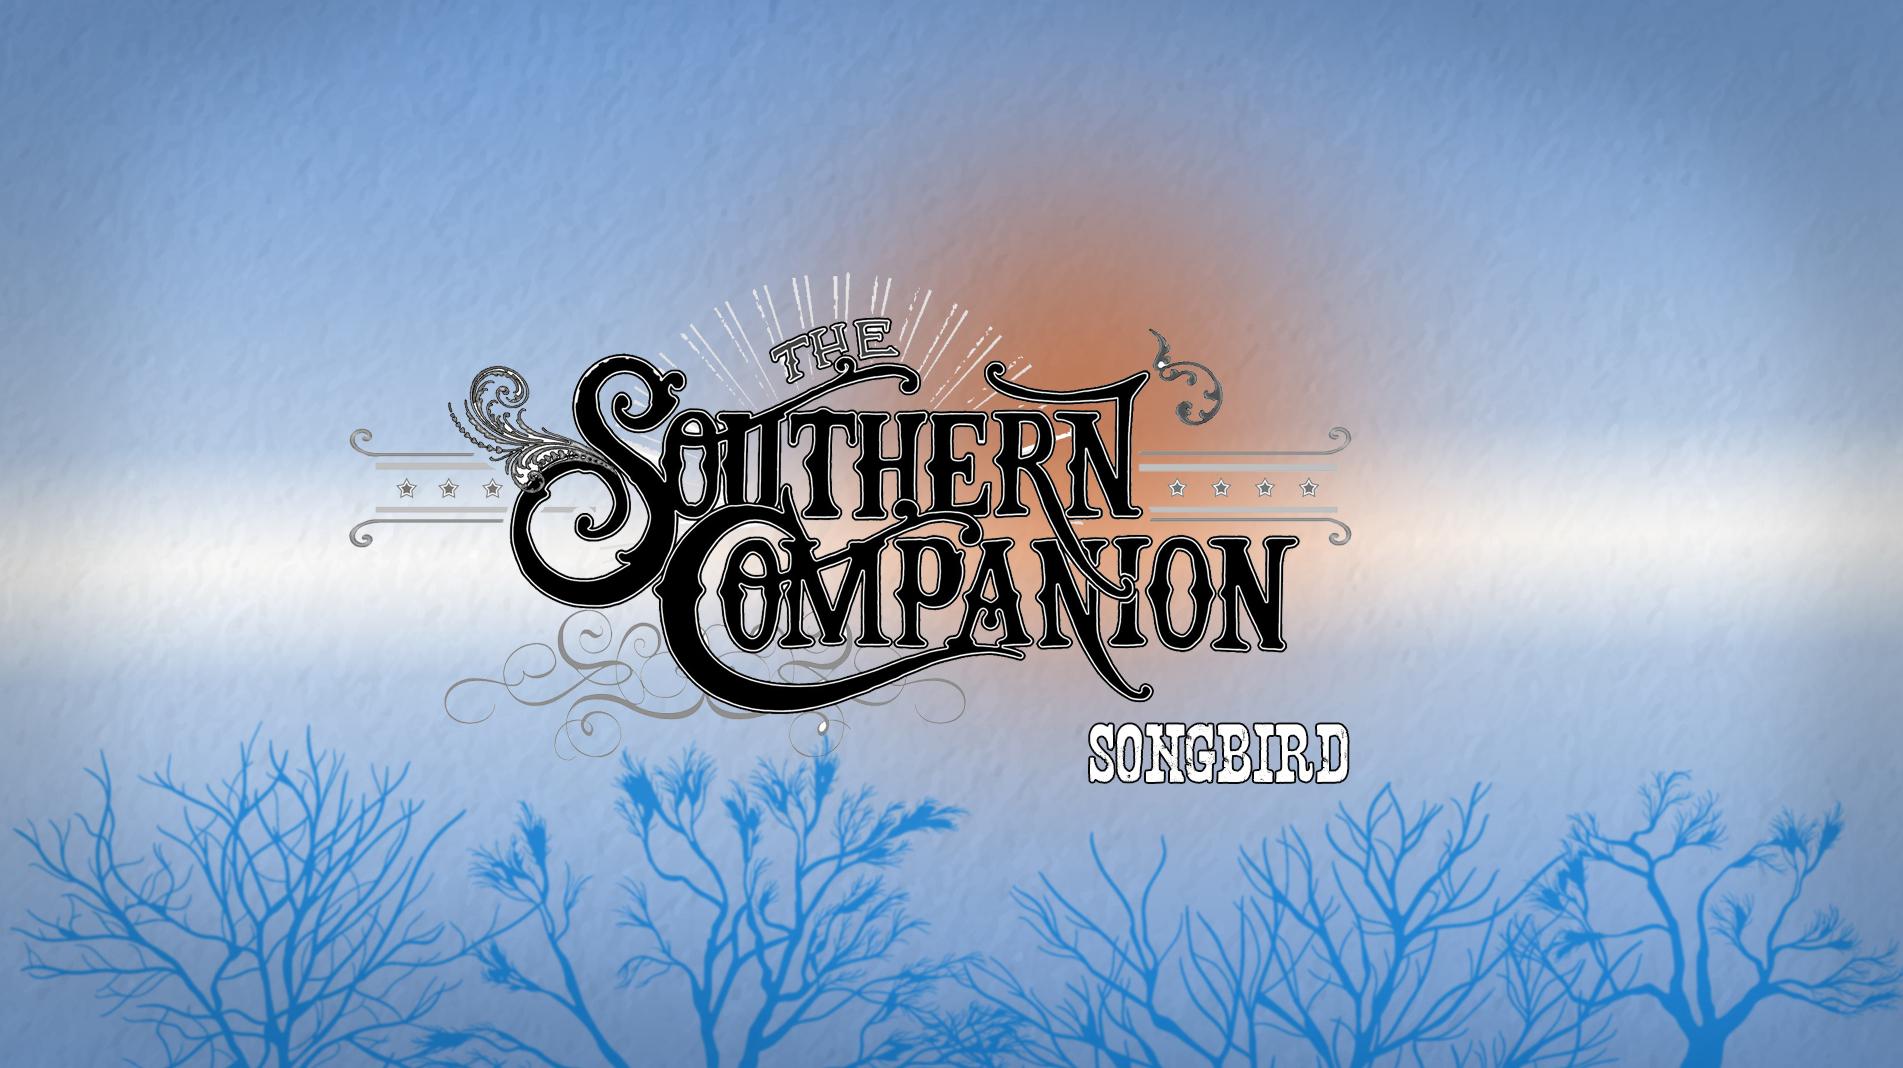 Southern Companion: Songbird